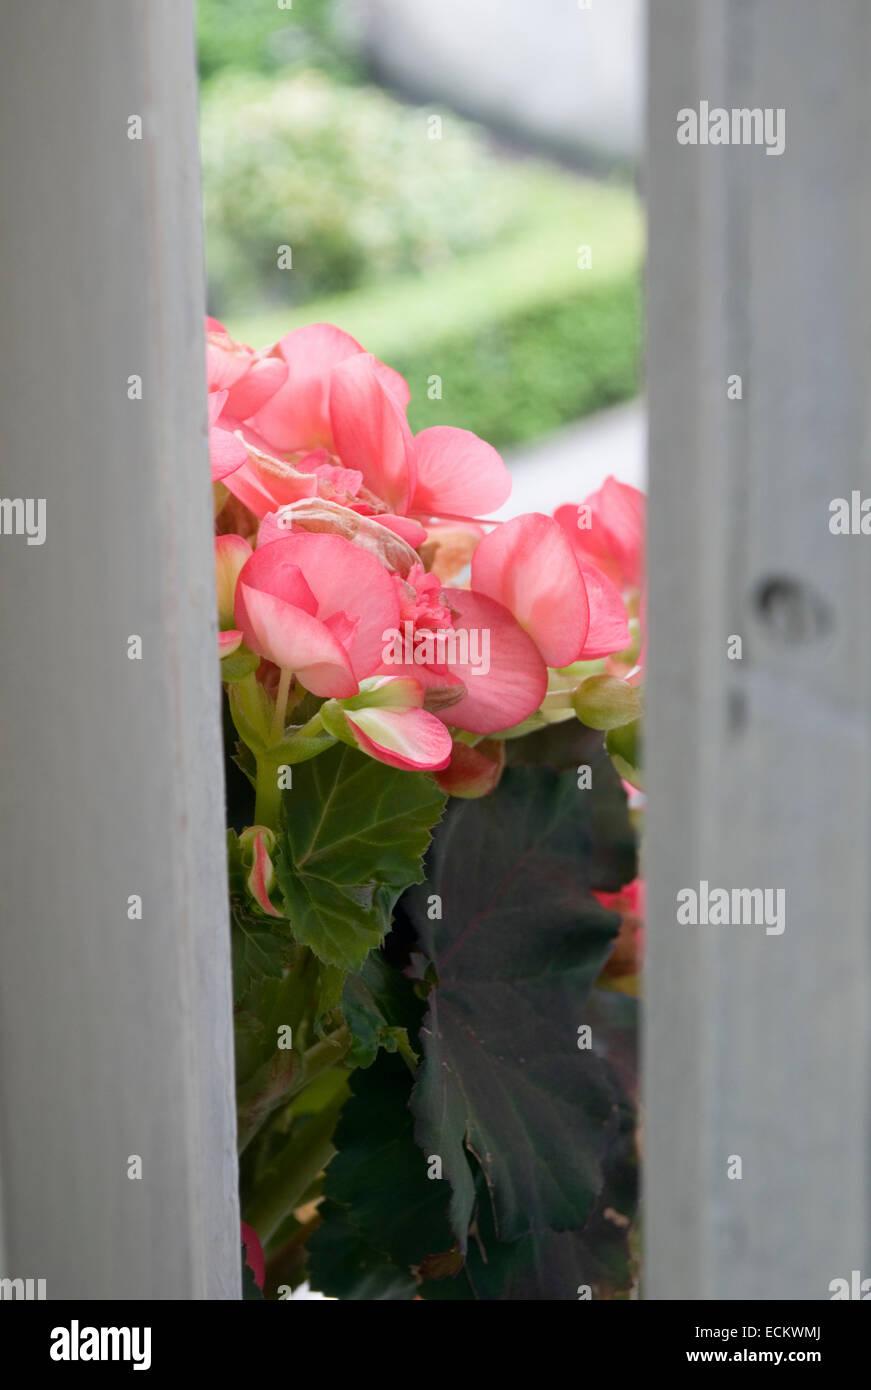 Flowers on windowsill - Stock Image